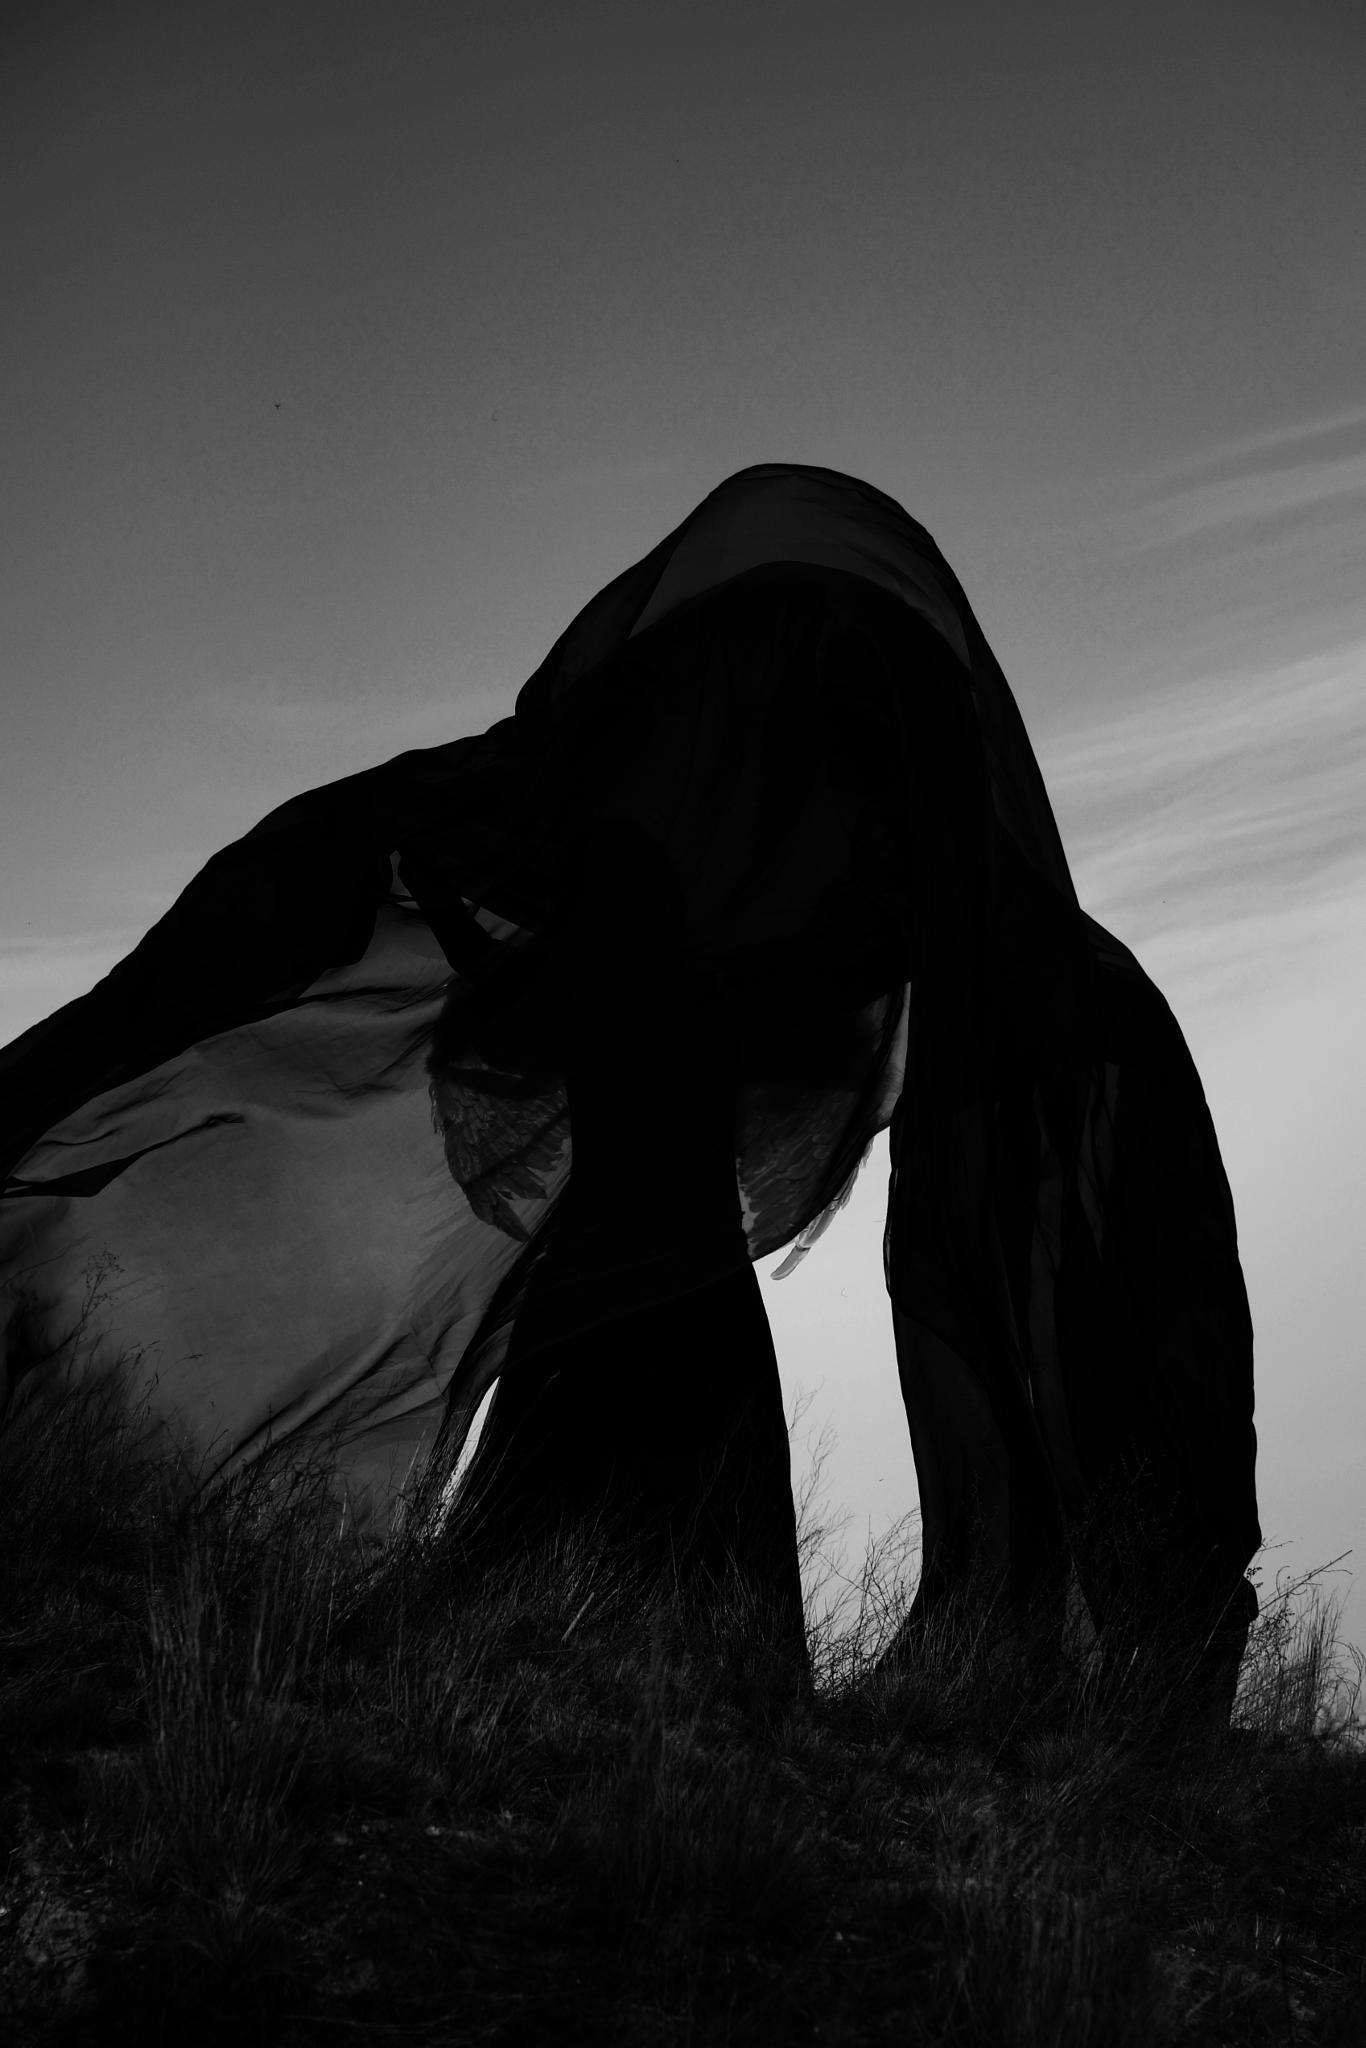 Black angel by Ania K-S